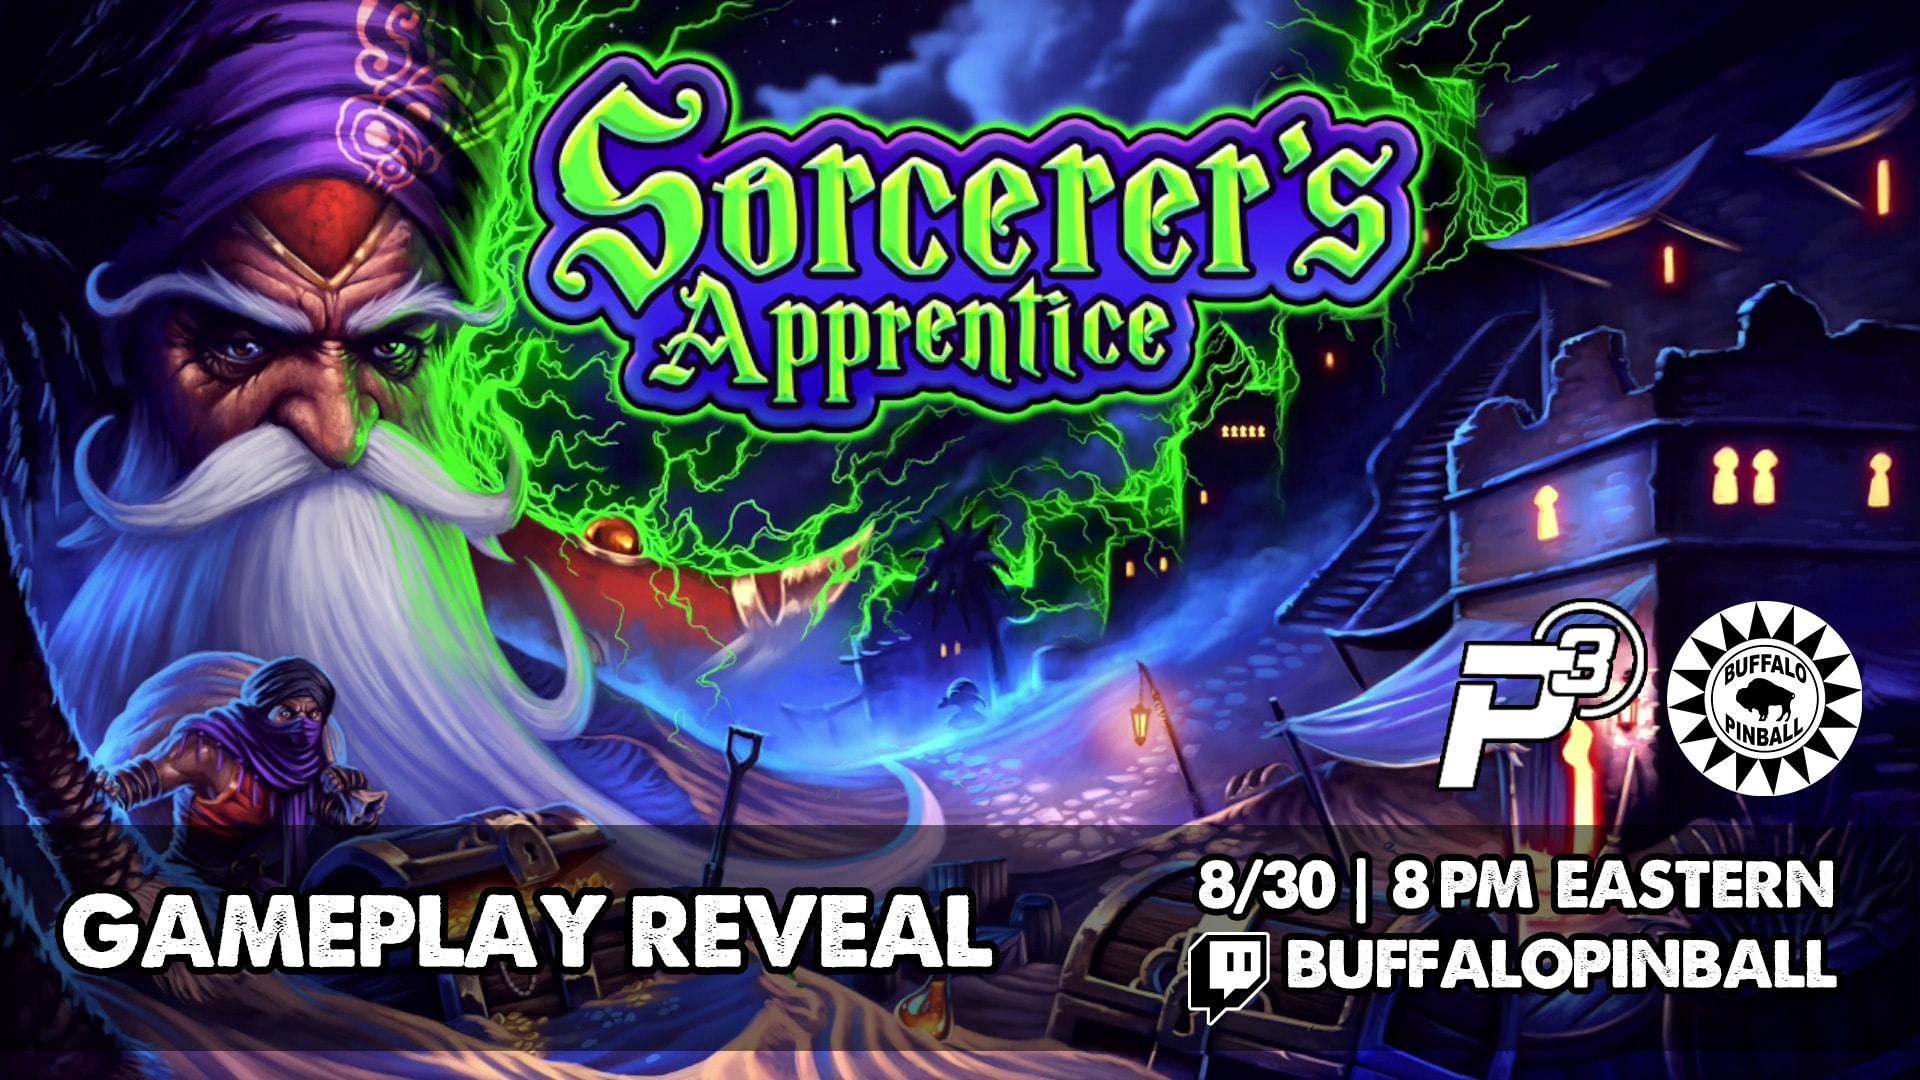 Buffalo Pinball Reveals Sorcerer's Apprentice